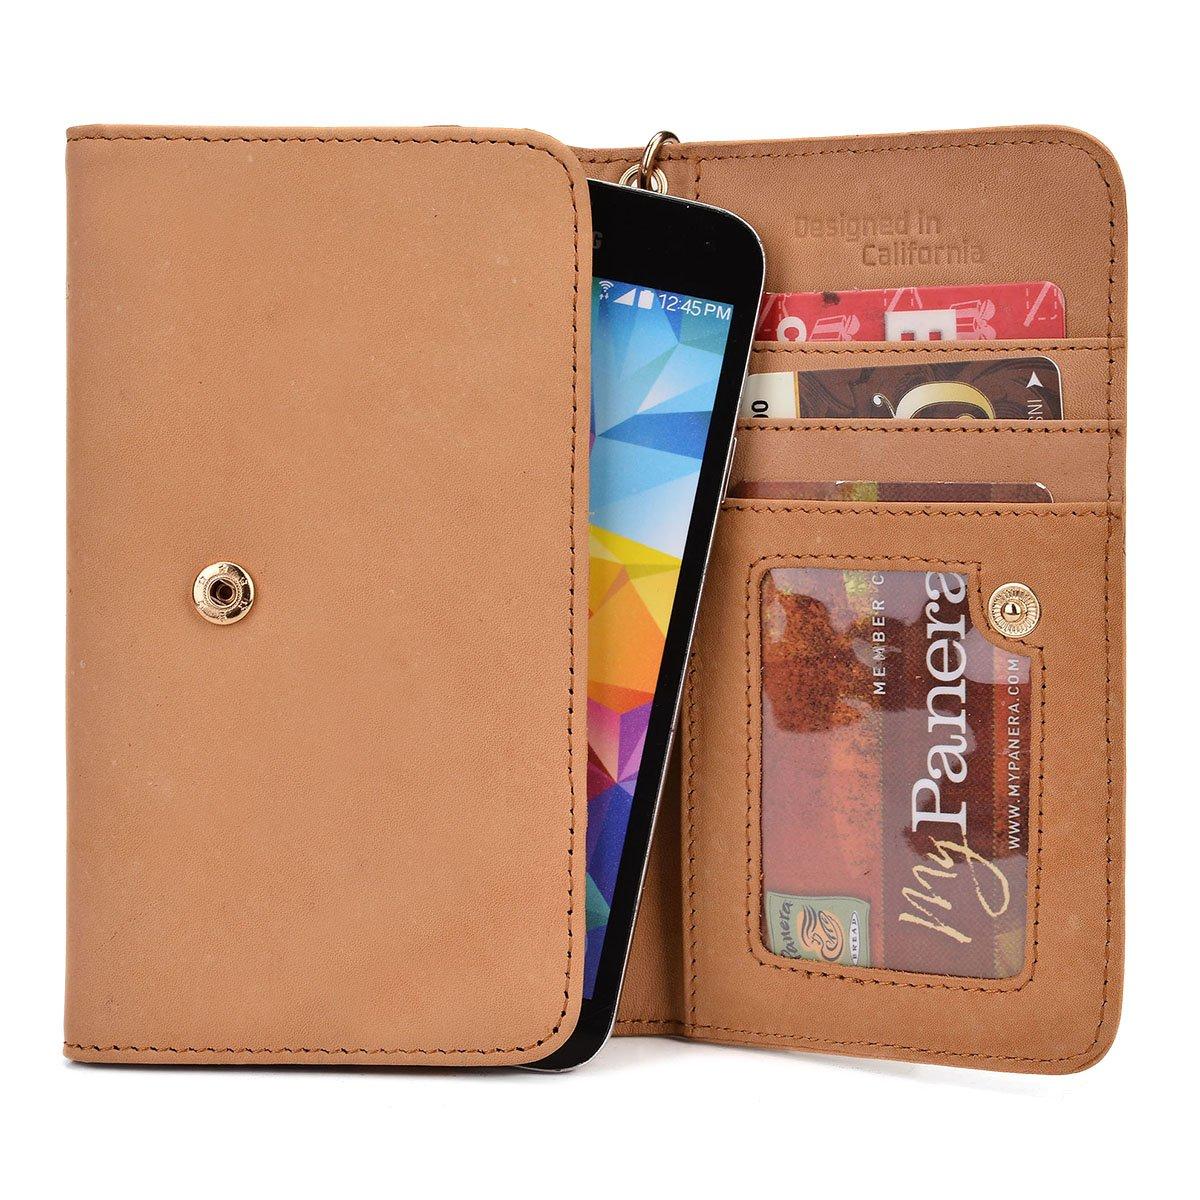 Amazon.com: Ekatomi174; Genuine Leather Cell Phone Cover ...